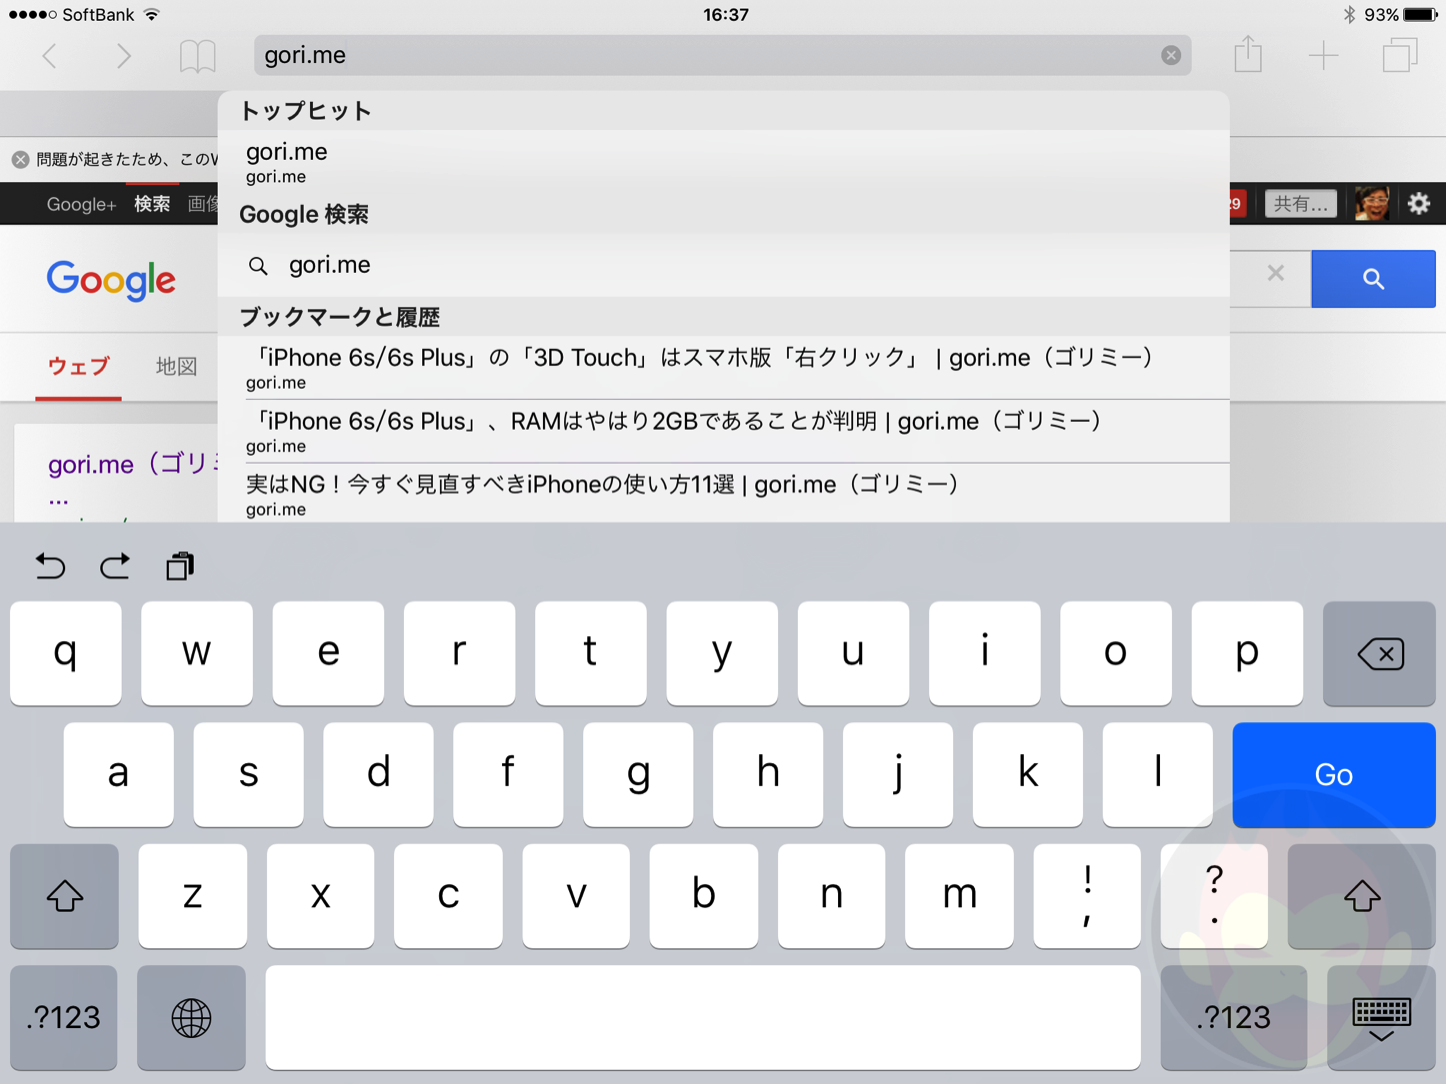 iOS-9-iPad-Screen-Shot-32.png